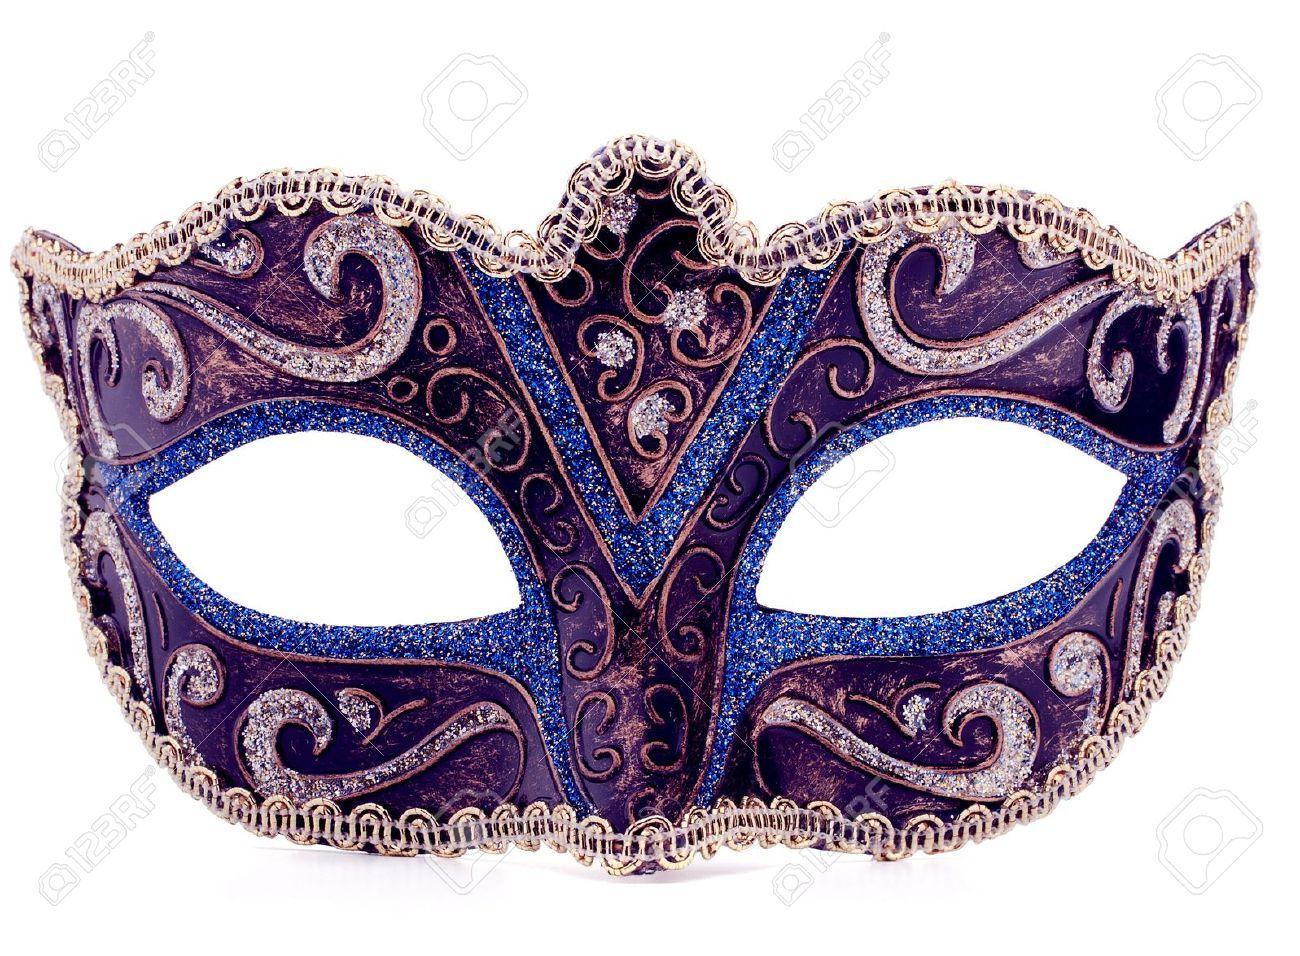 19514775-venetian-carnival-mask-isolated-on-white ...